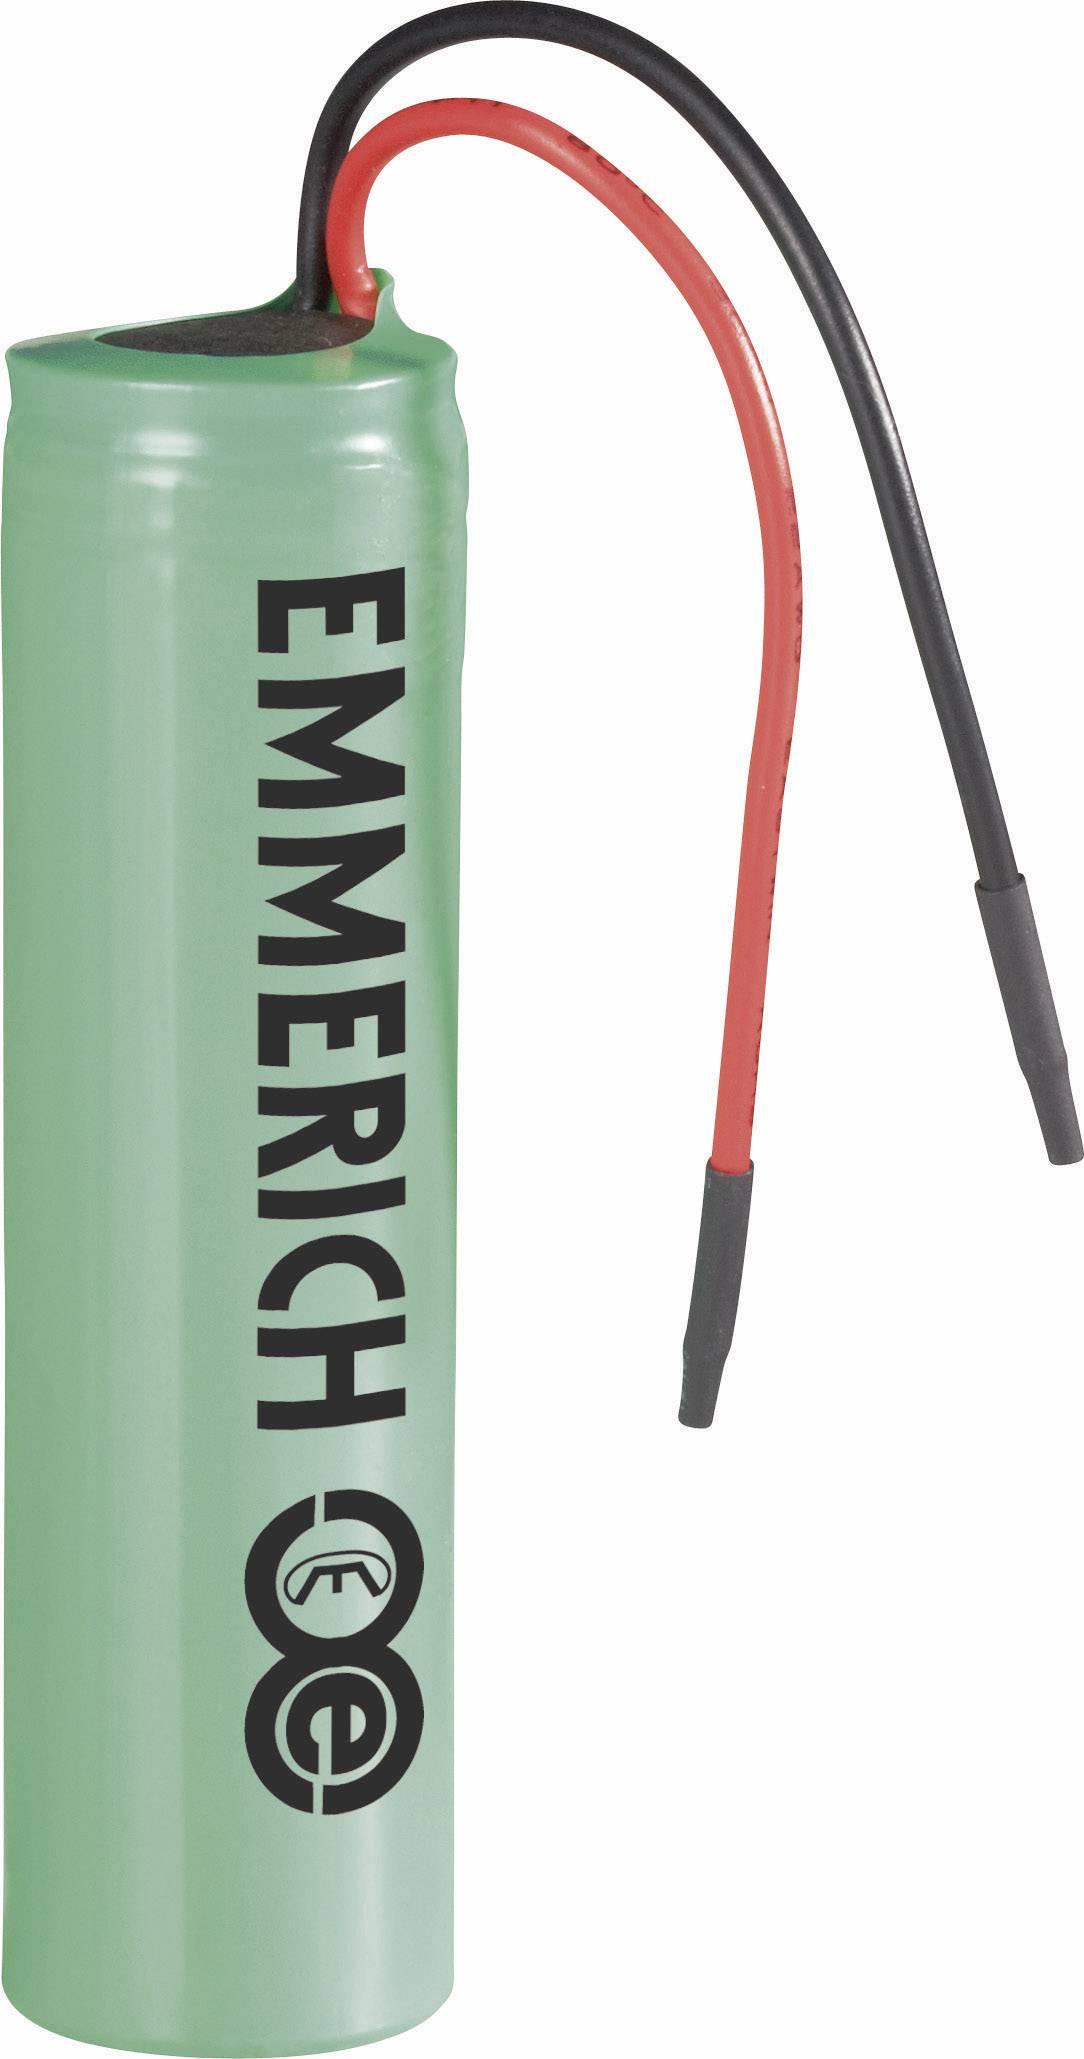 Akumulátor Emmerich Li-Ion ICR -18650 NH-SP